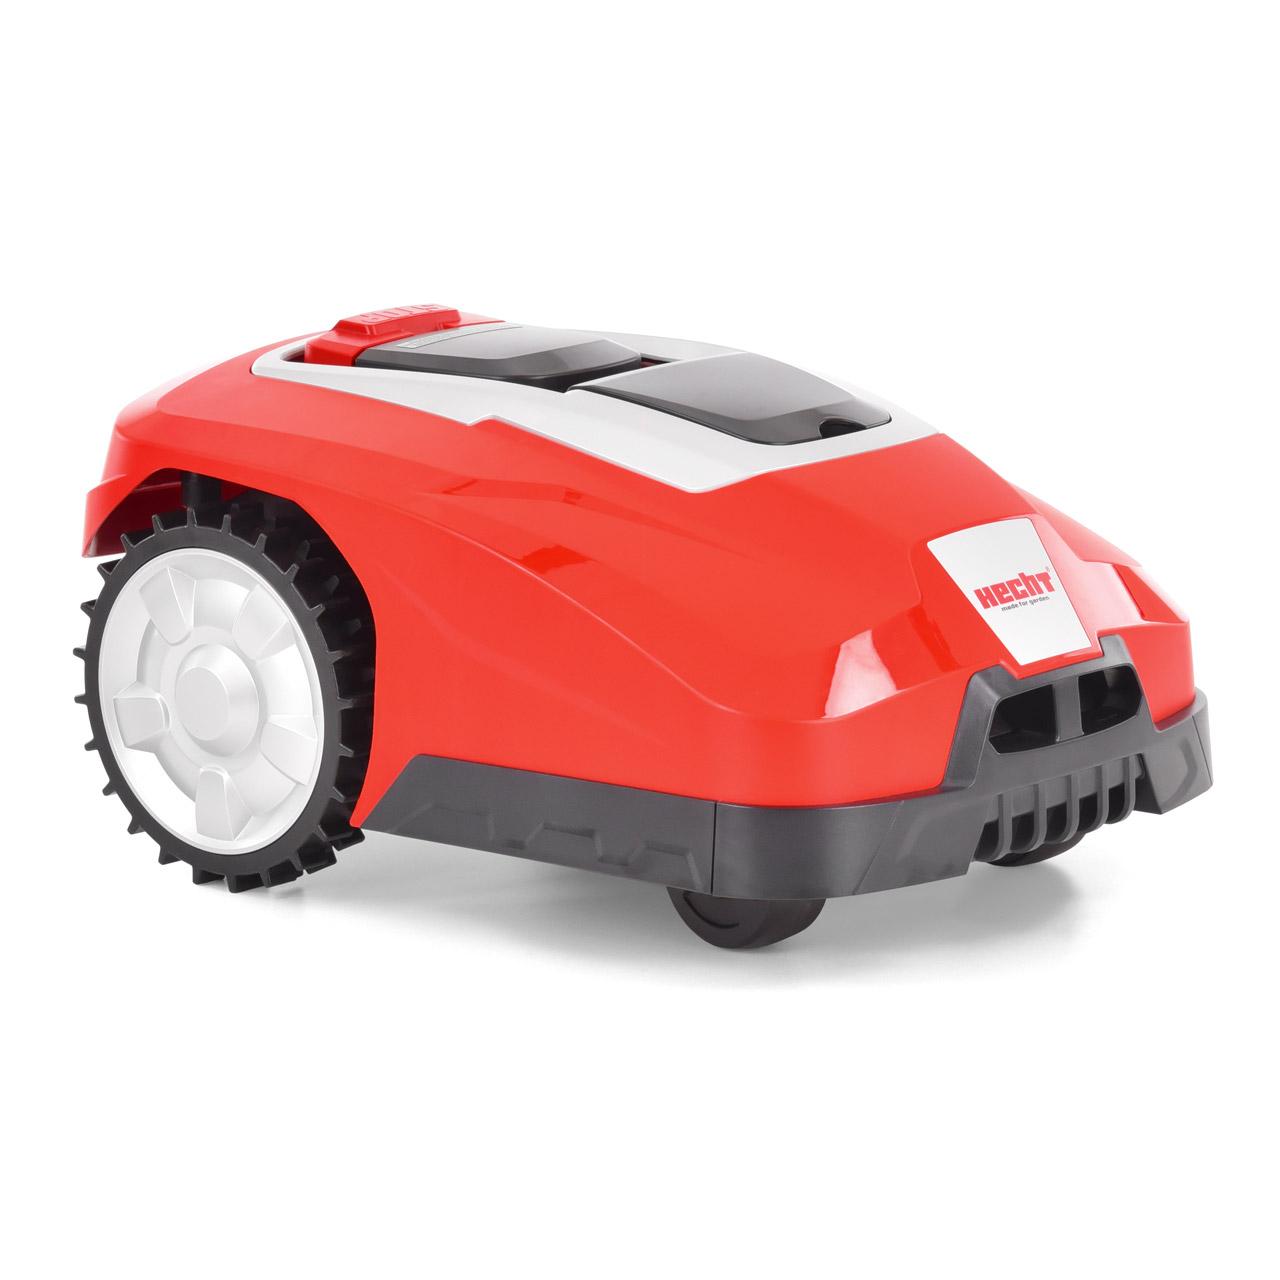 HECHT 5601 - robotická sekačka